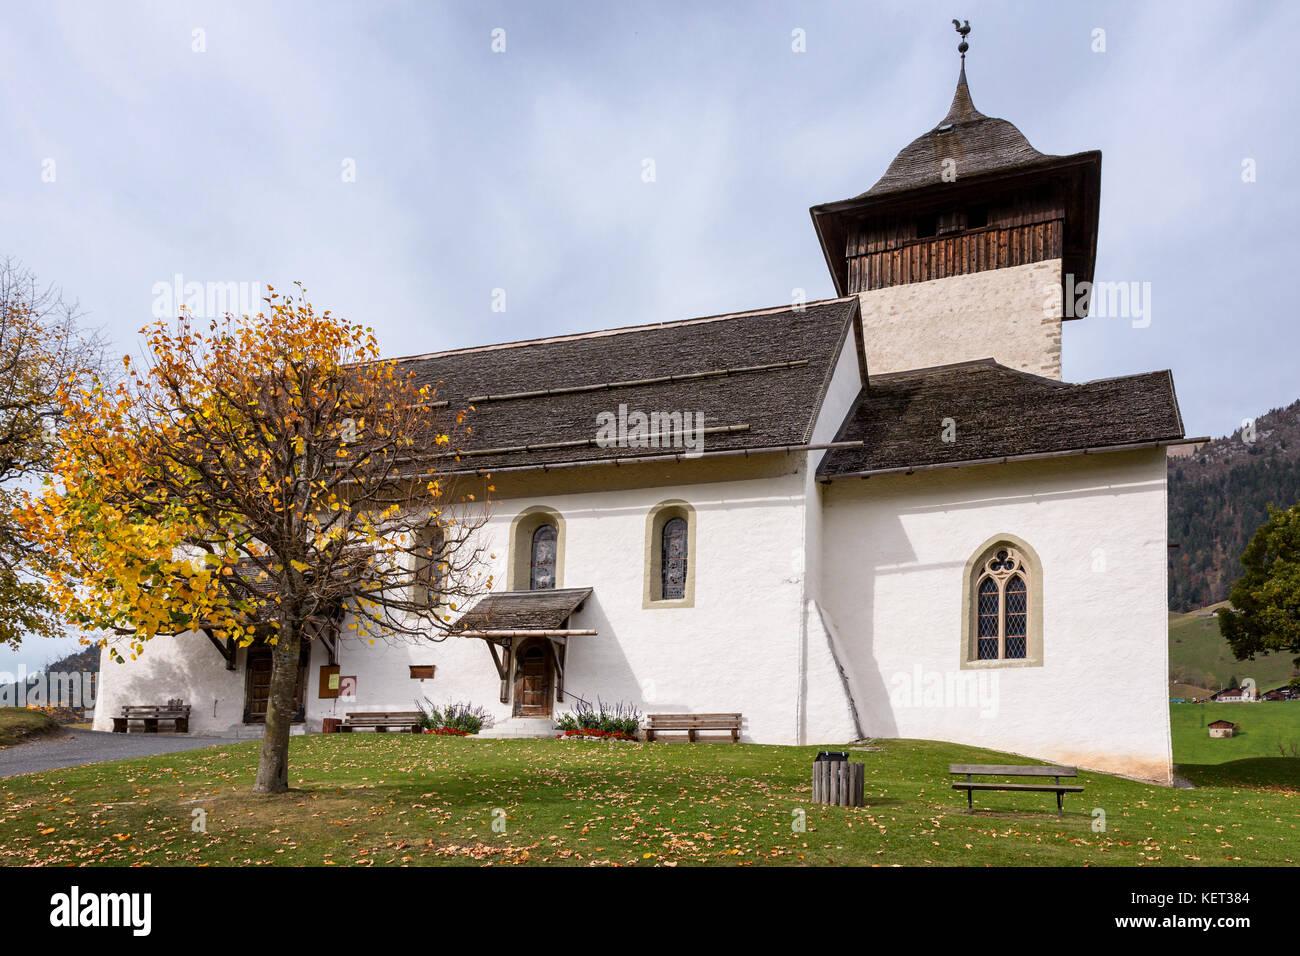 The church of Chateau-D'Oex, Vaud, Switzerland Stock Photo